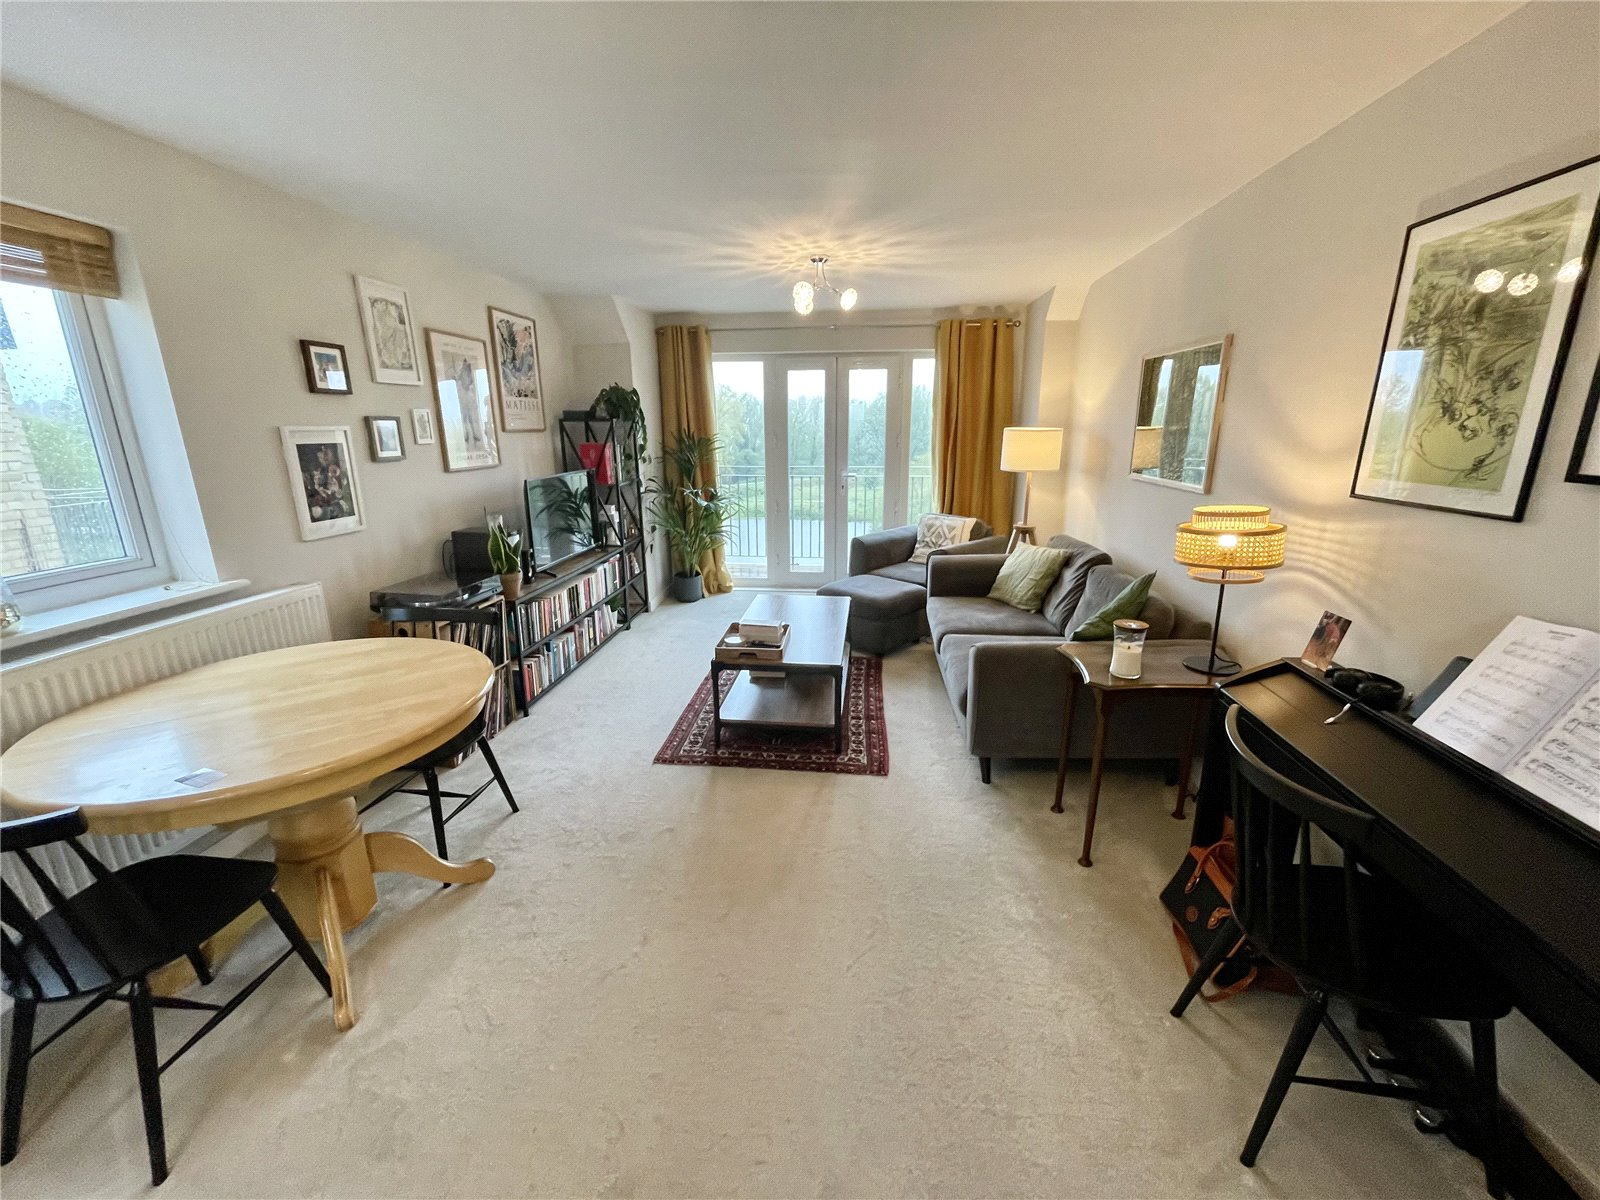 2 bed apartment for sale in Wren Walk, Eynesbury - Property Image 1